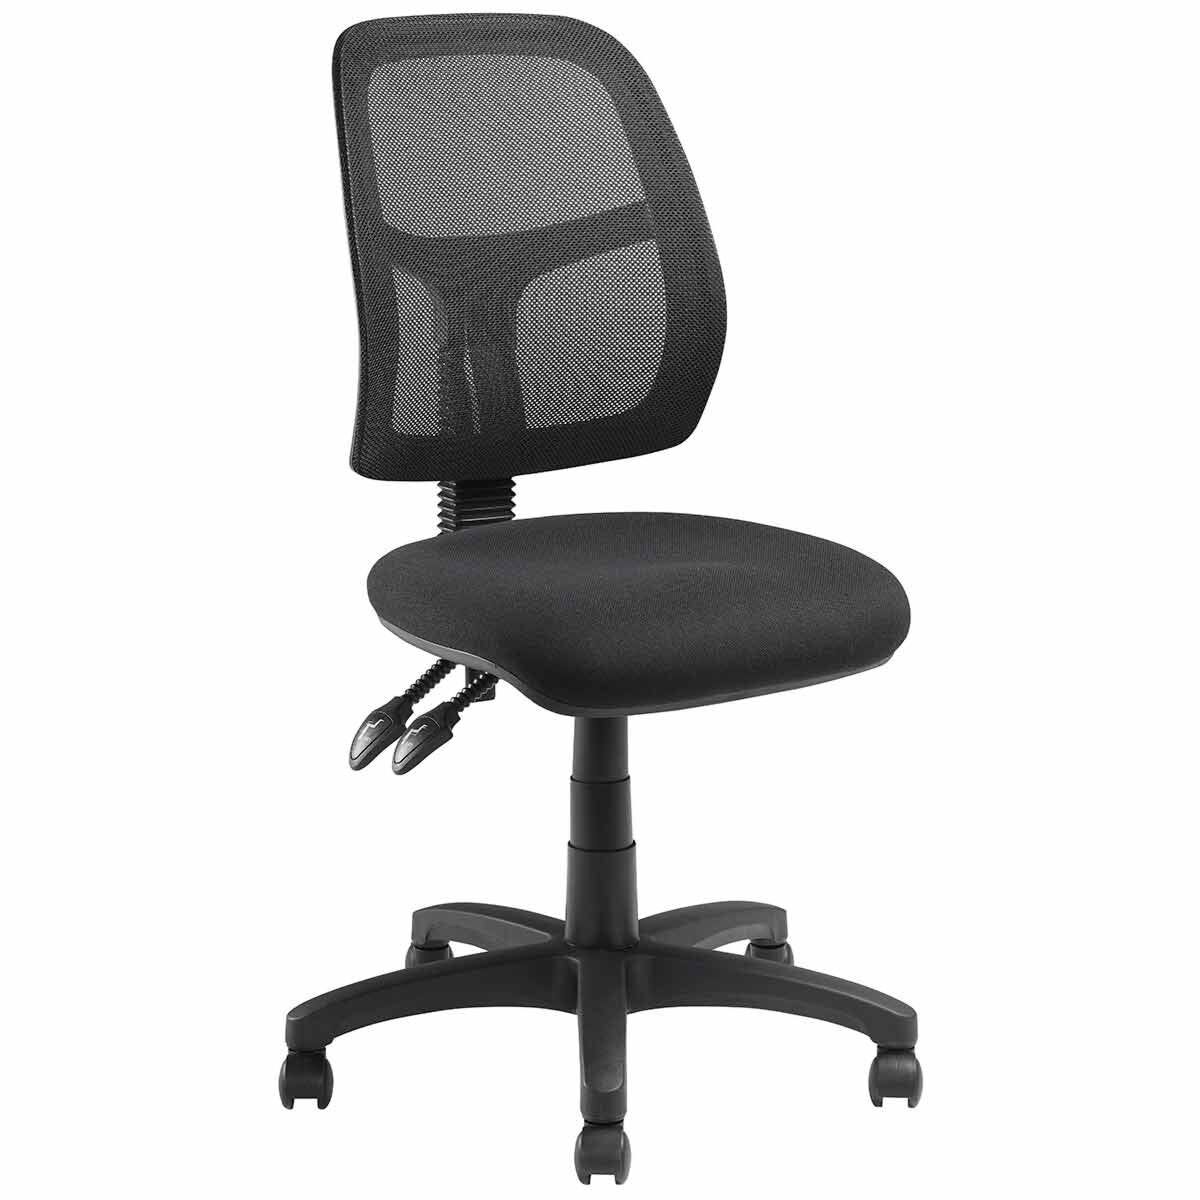 Pago Jet II Mesh Ergonomic Twin Lever Operator Chair